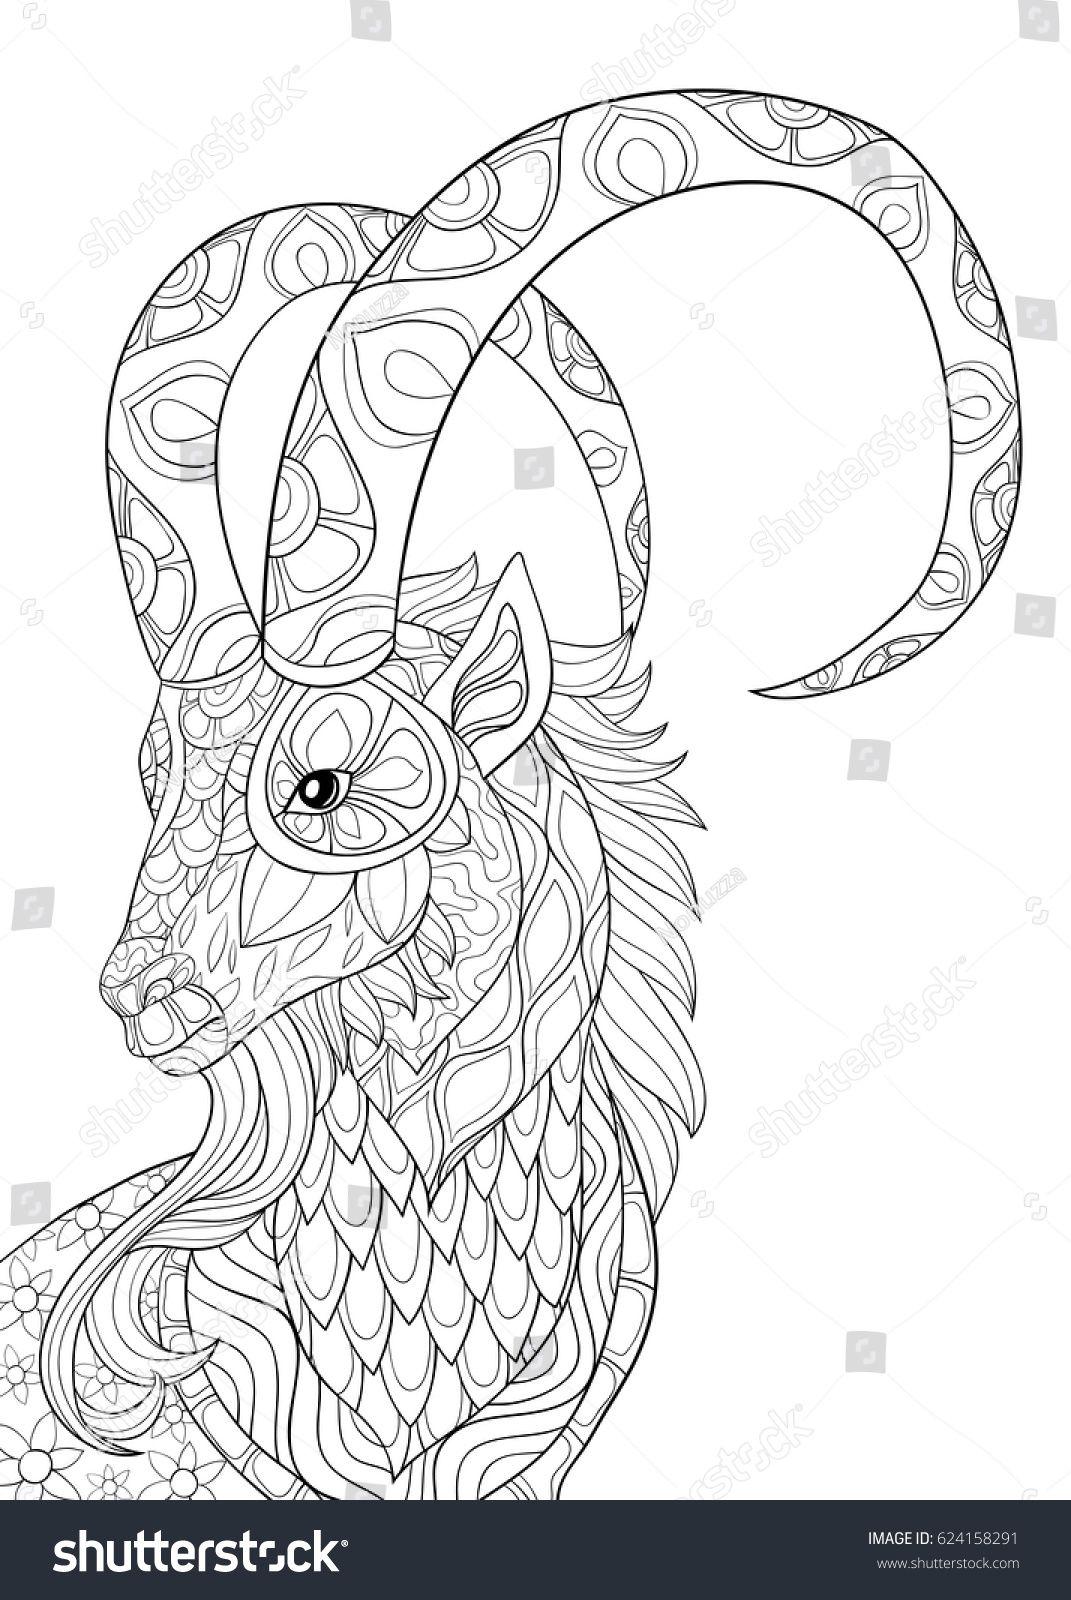 Adult Coloring Page GoatZen Art Style Illustration